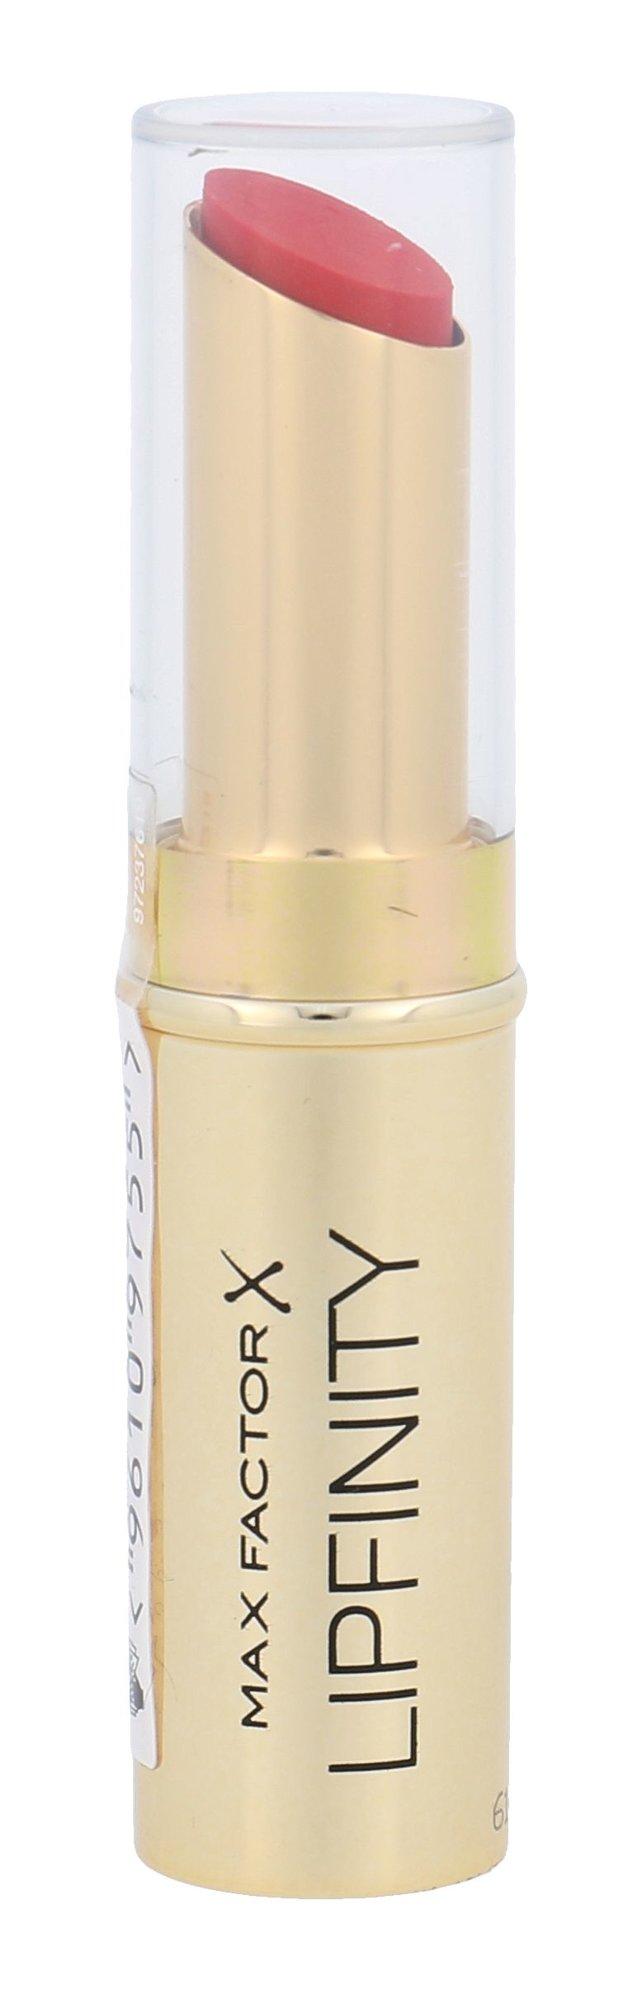 Max Factor Lipfinity Cosmetic 3,4ml 35 Just Deluxe